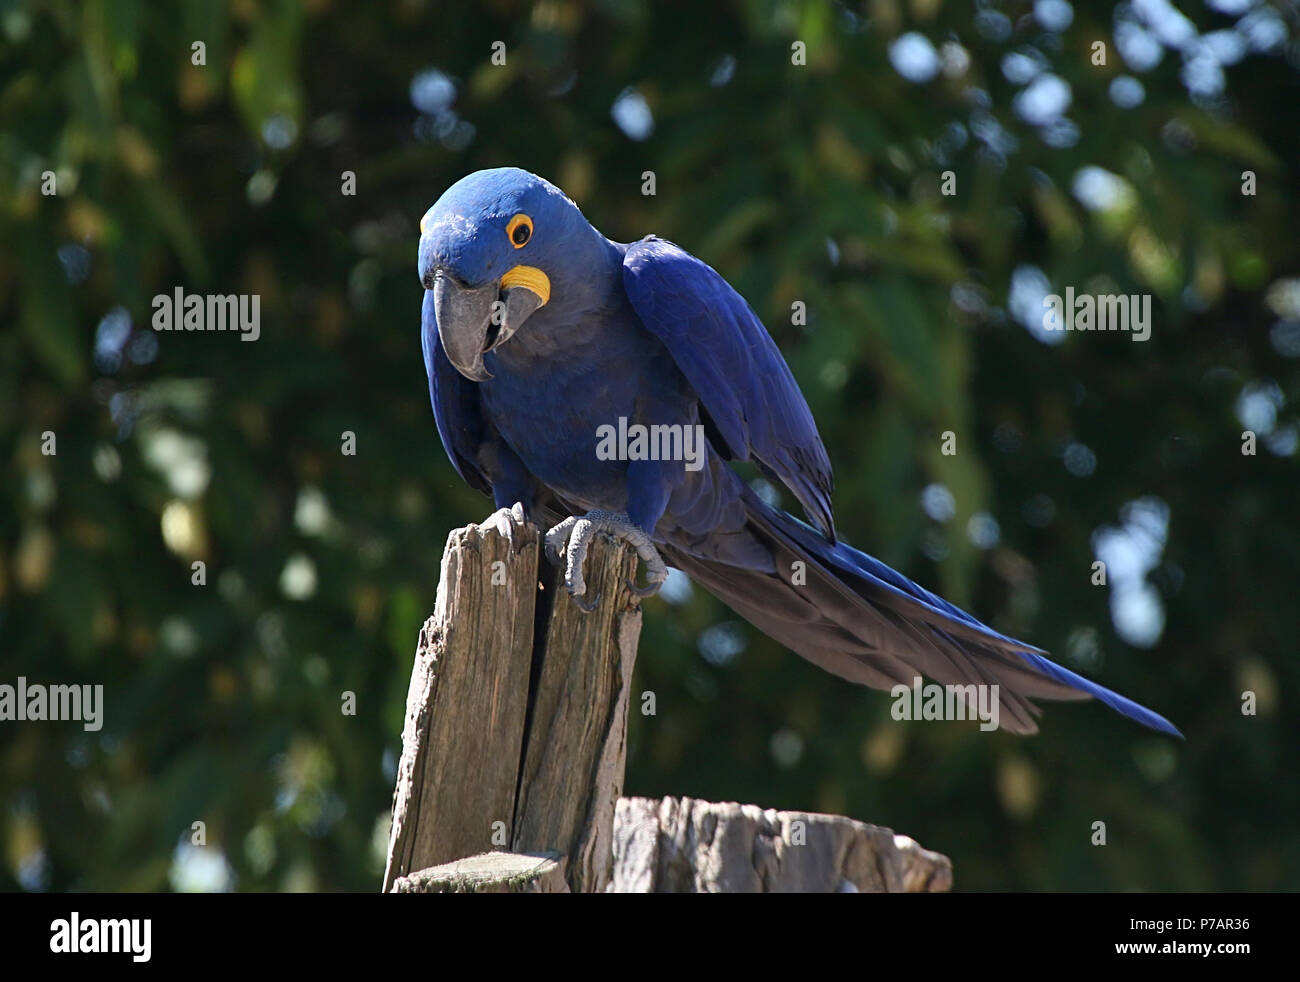 South American Hyacinth Macaw (Anodorhynchus hyacinthinus). in closeup. Stock Photo